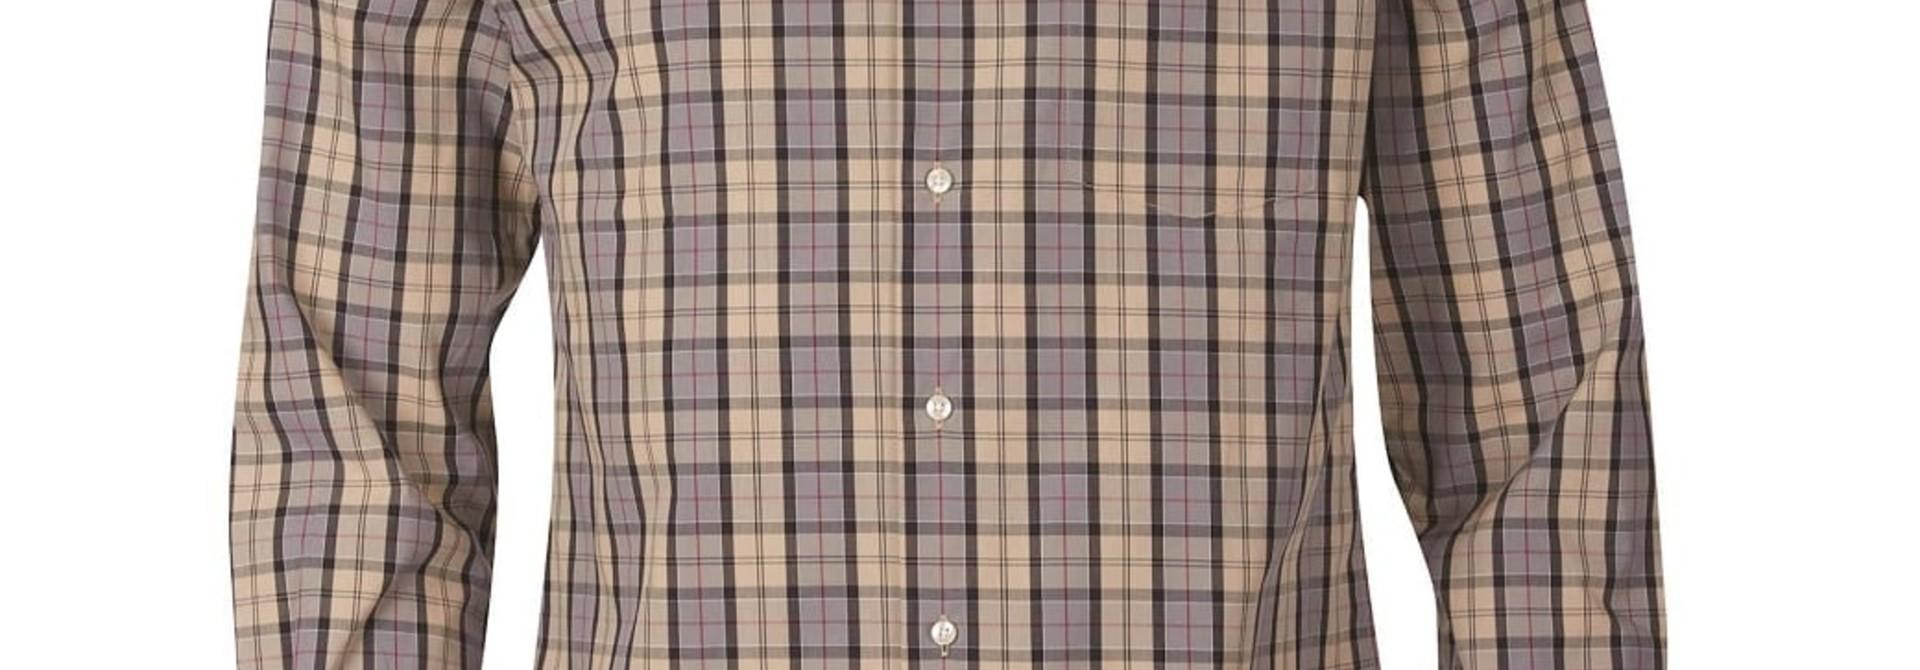 Barbour Tartan 17 Tailored  Shirt Dress Tartan